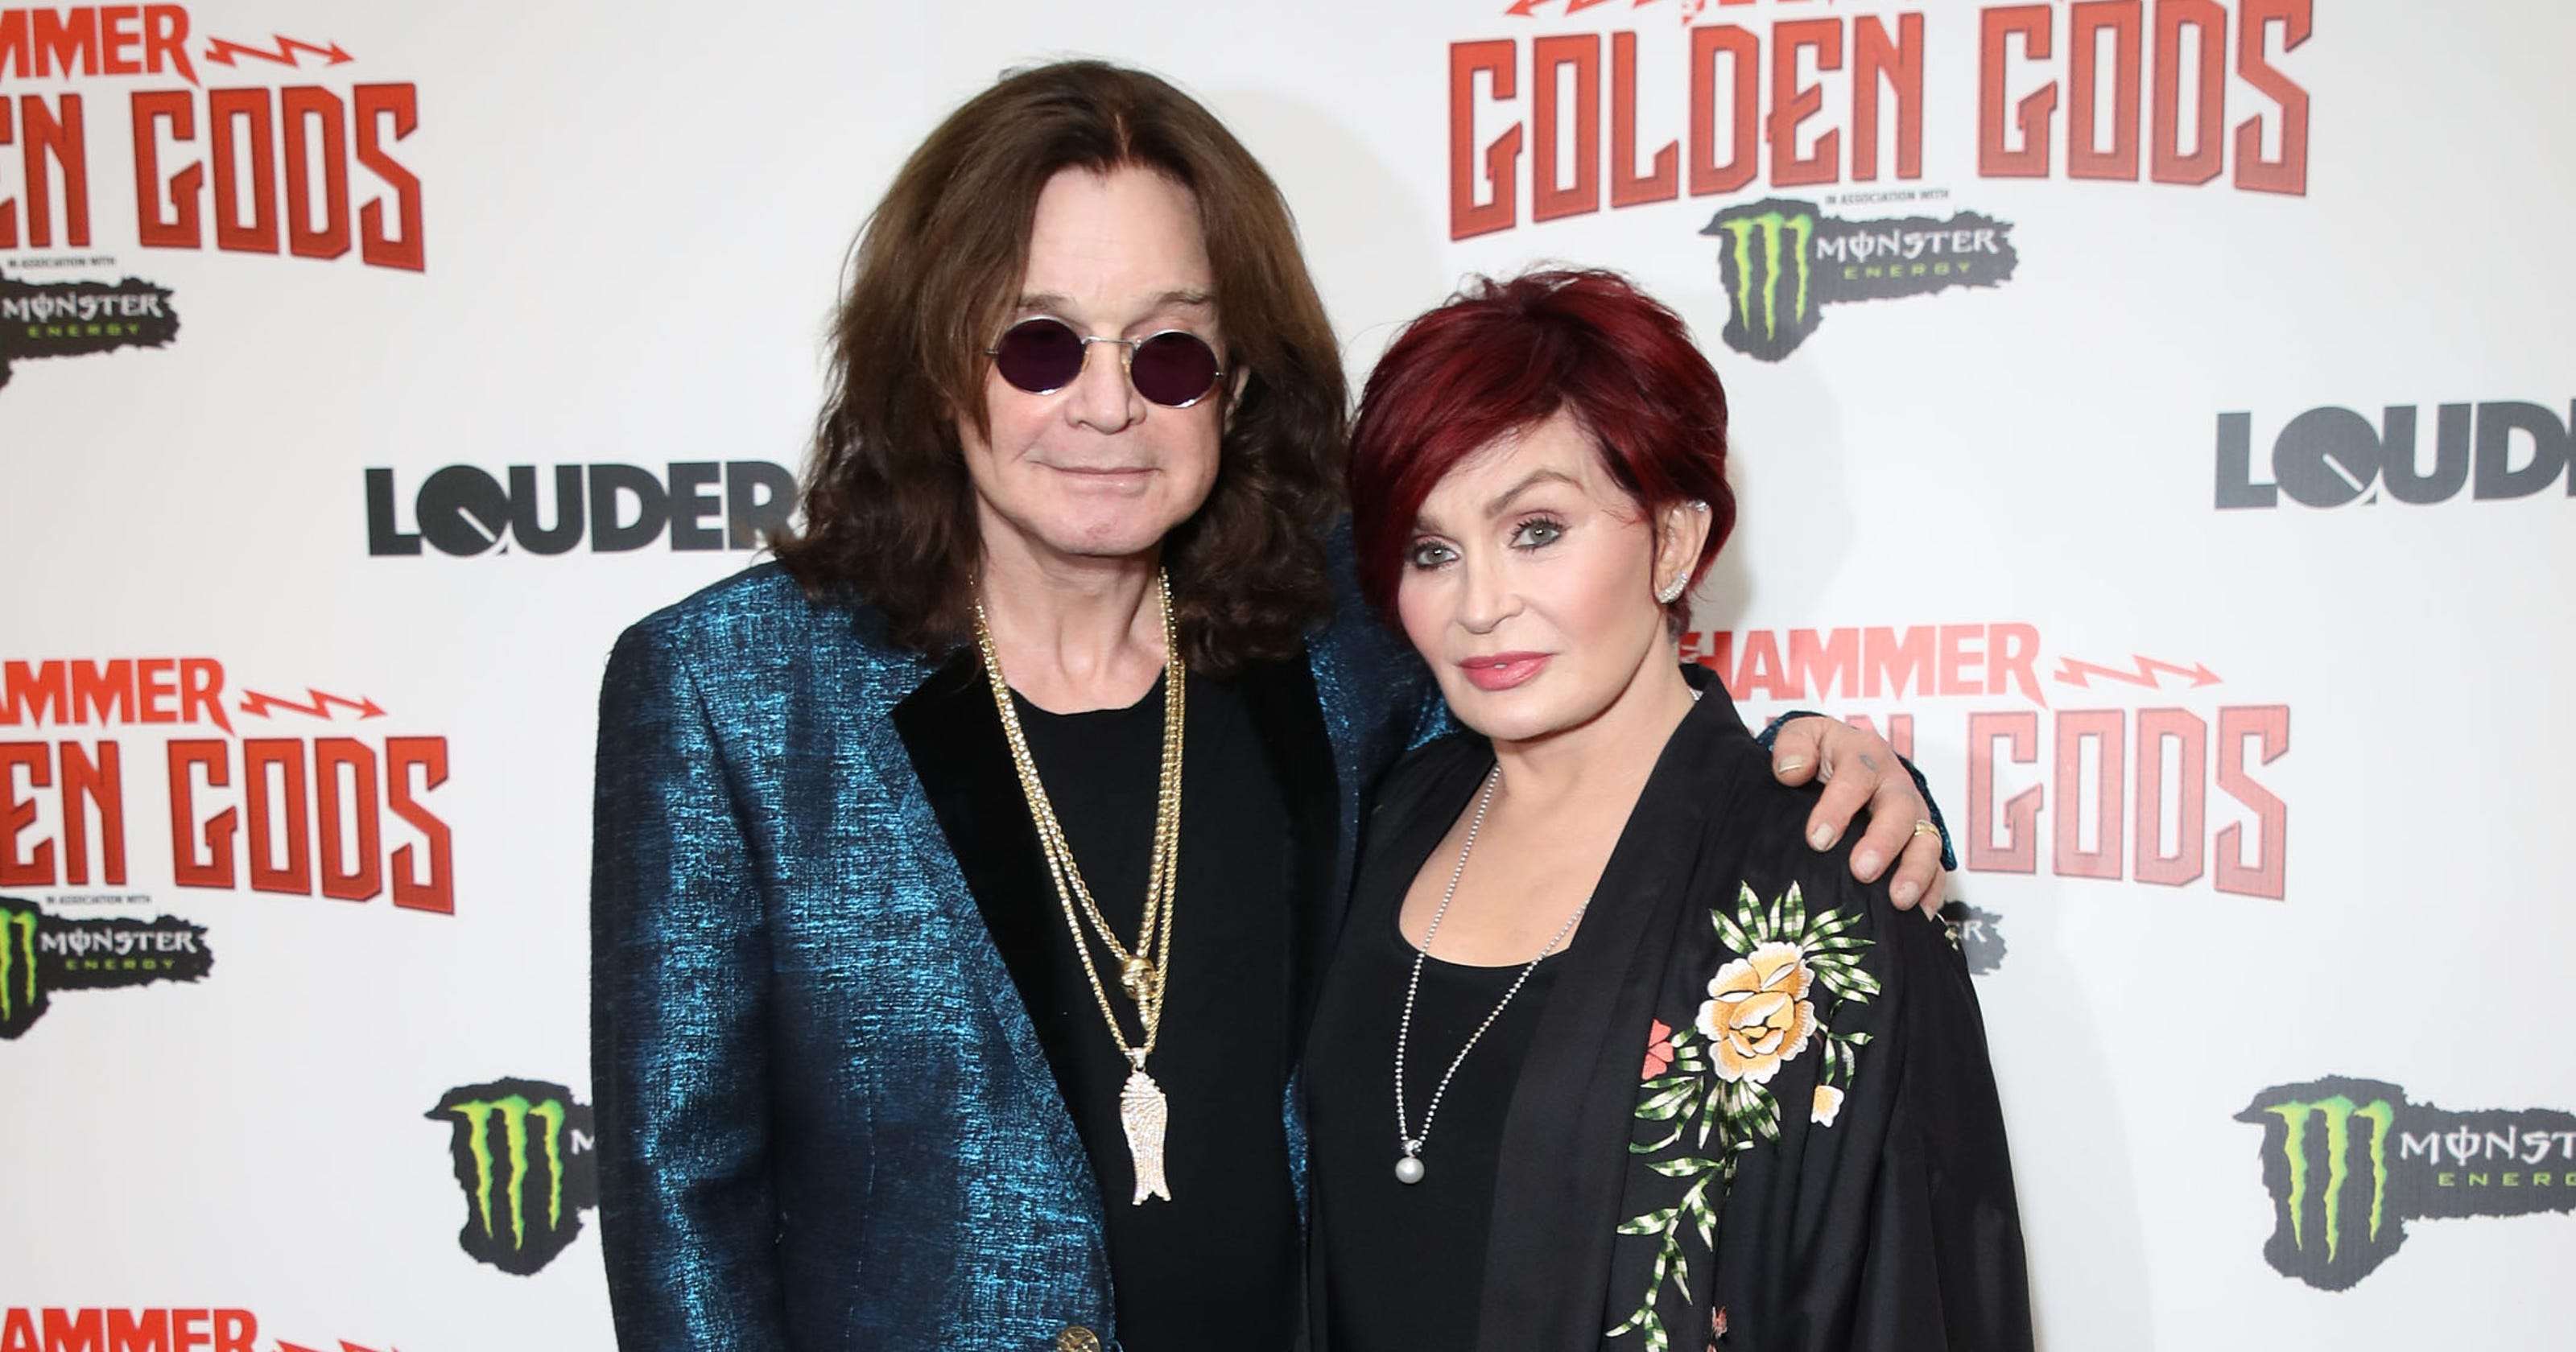 Sharon Osbourne tears up talking about Ozzy's health